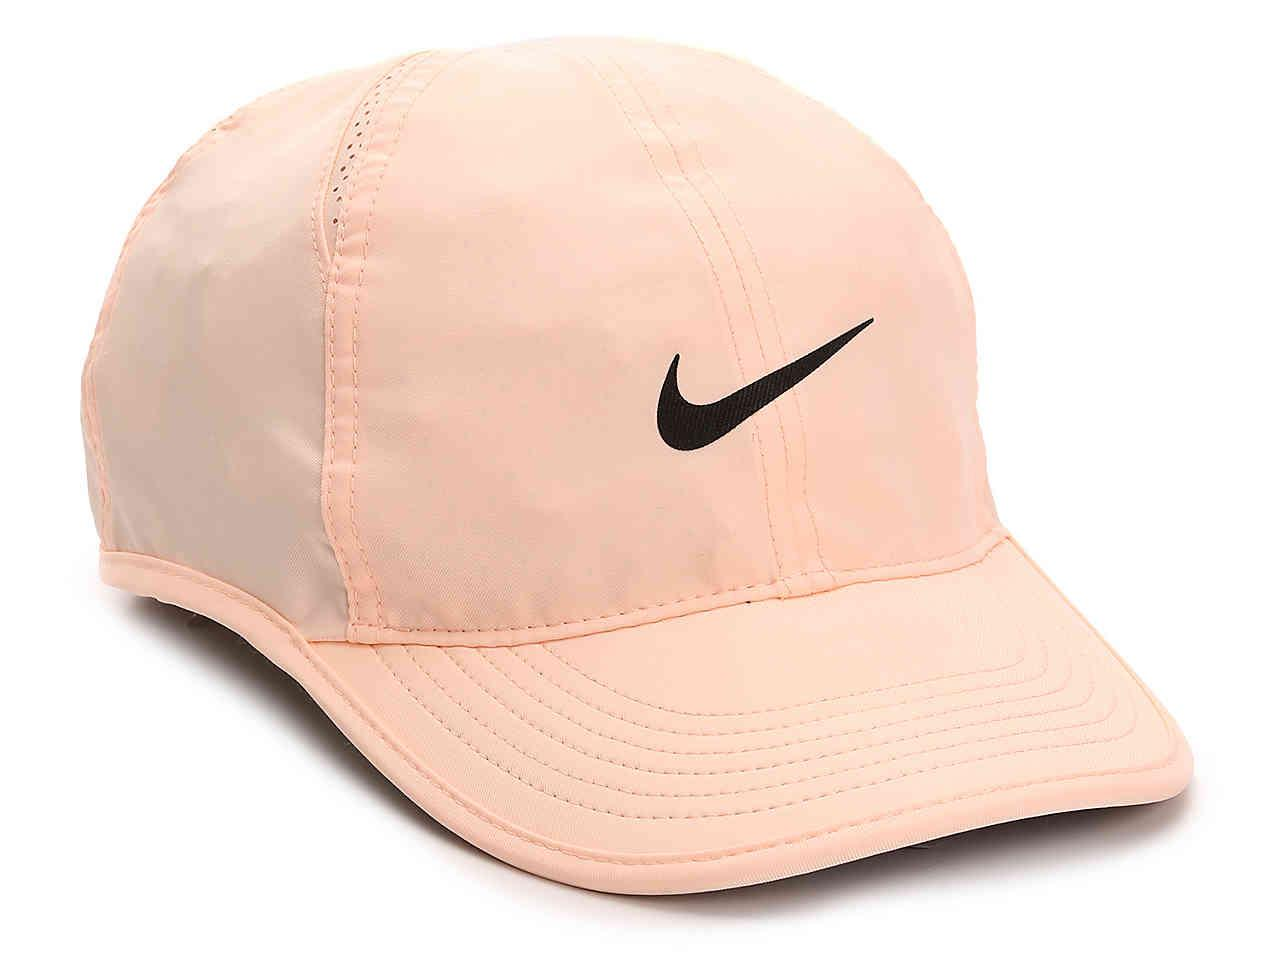 047f568626a ... uk lyst nike aerobill featherlight baseball cap in pink for men e4ca6  3c3da